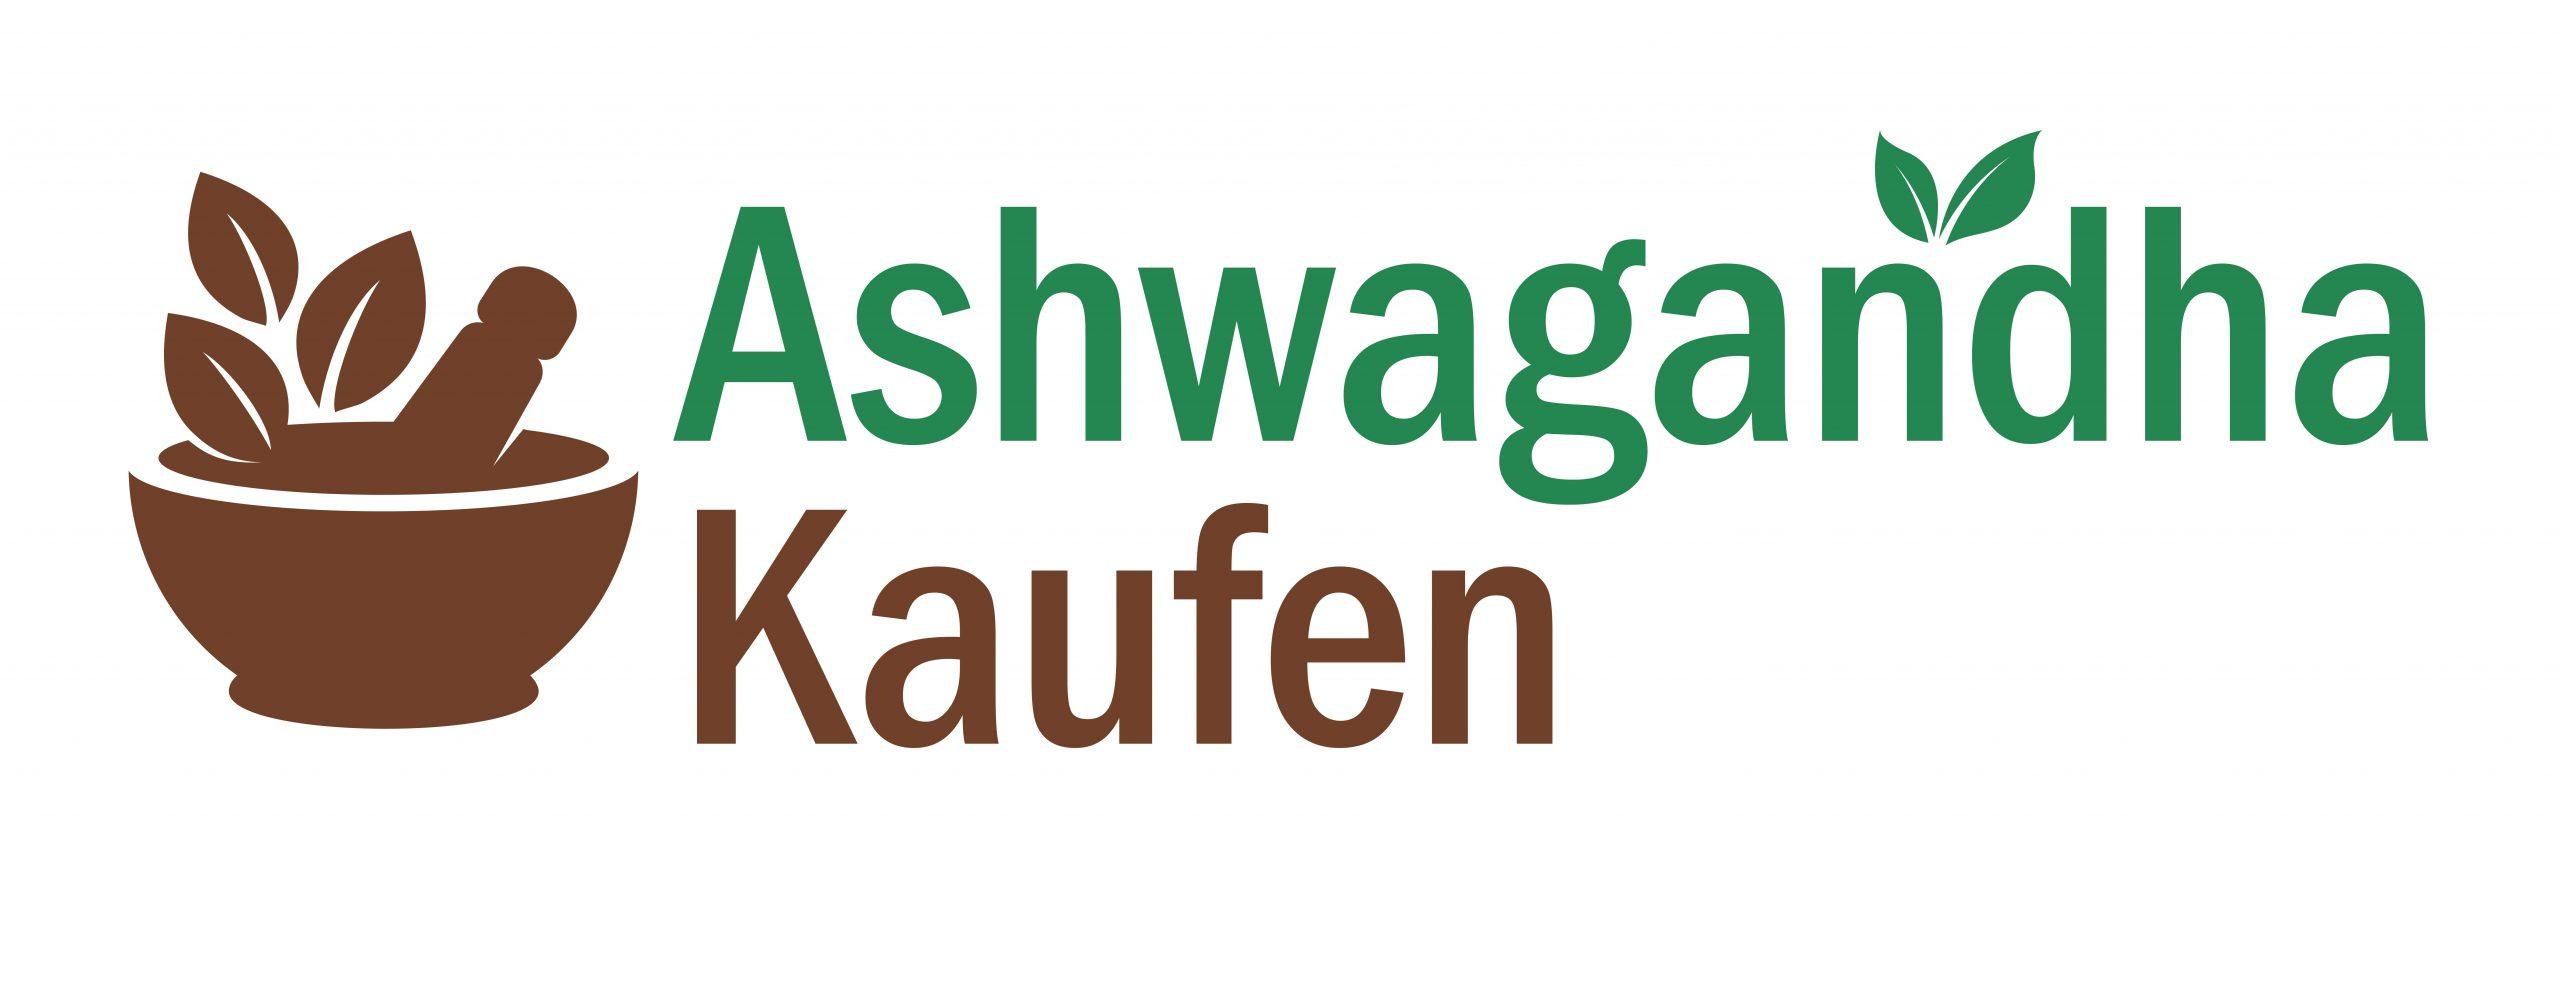 ashwagandhakaufen.de